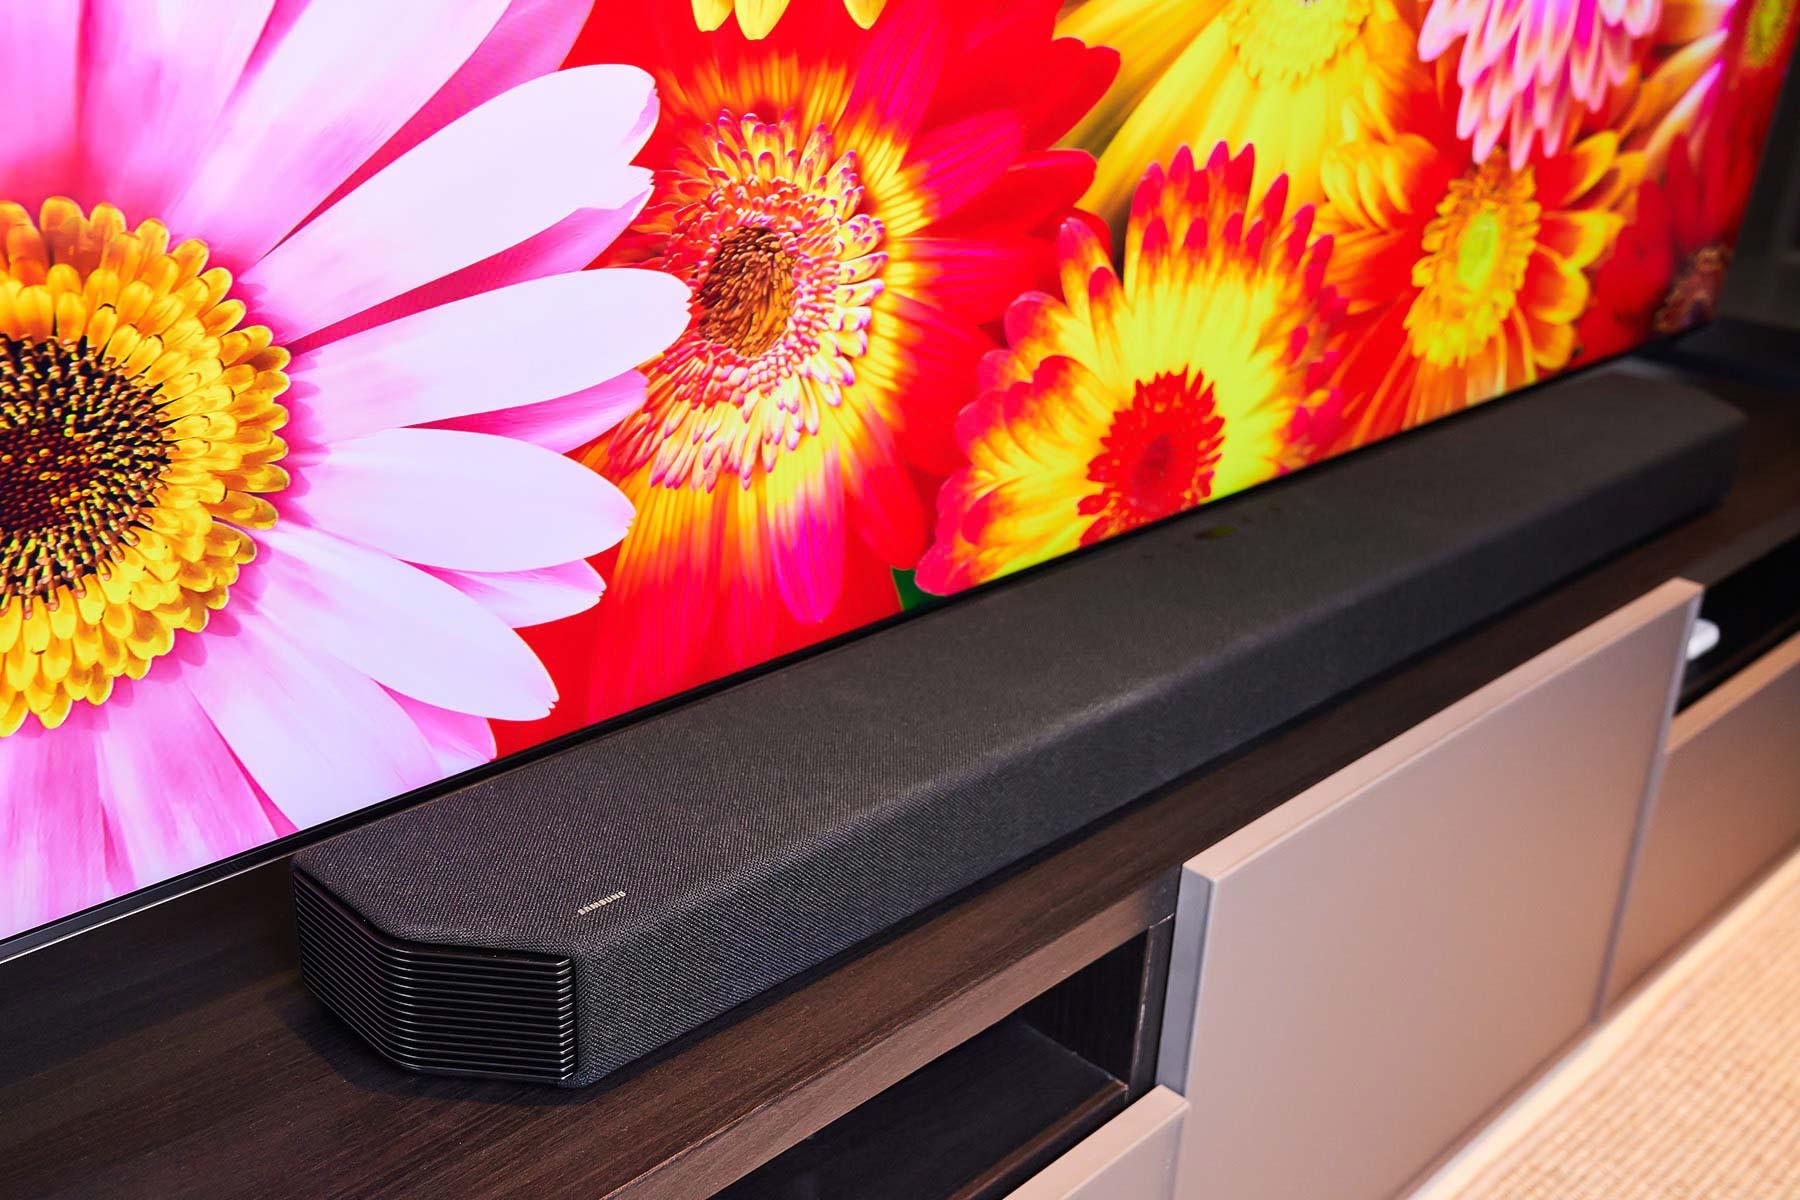 Samsung 獨家魔幻音場技術,結合自家Q 系列Soundbar 產品,讓它與Neo QLED 8K 量子電視一同輸出音效,能帶來更豐沛的中低音,以及更寬闊的音場效果。